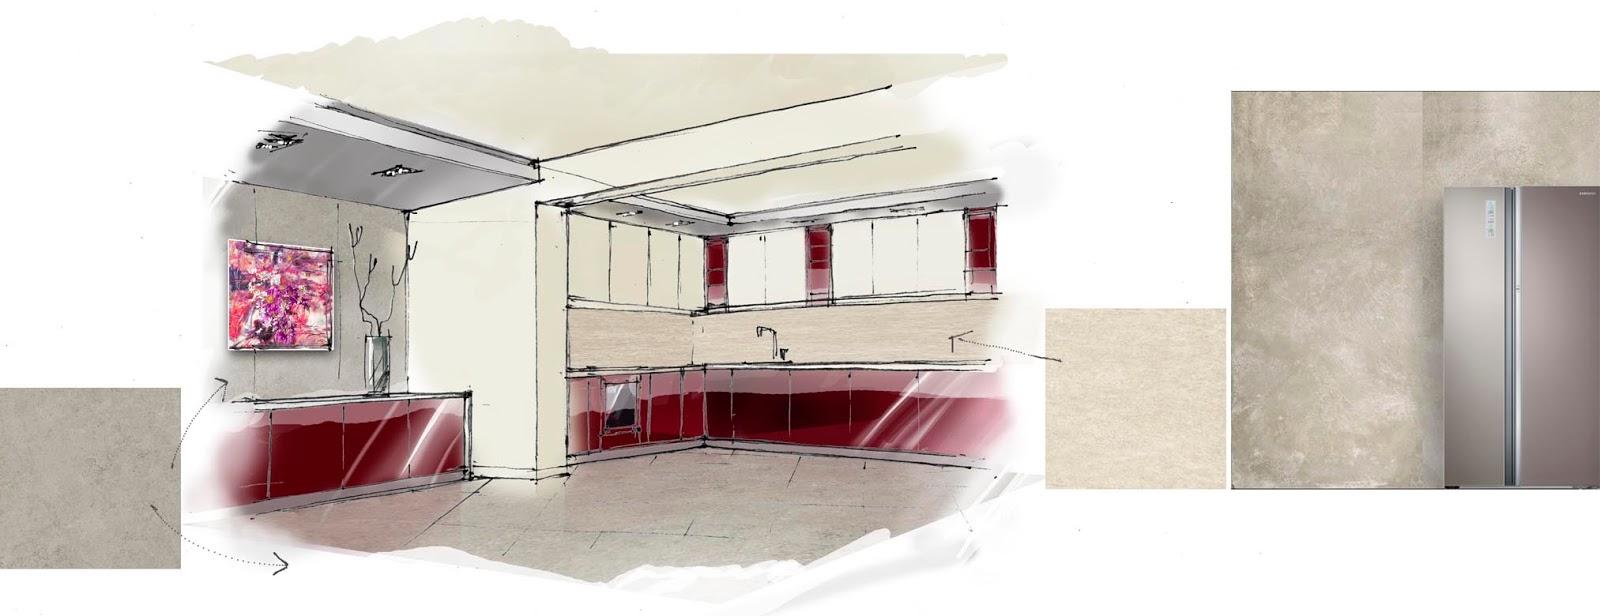 Ескіз приміщення кухні. Концепція дизайну.